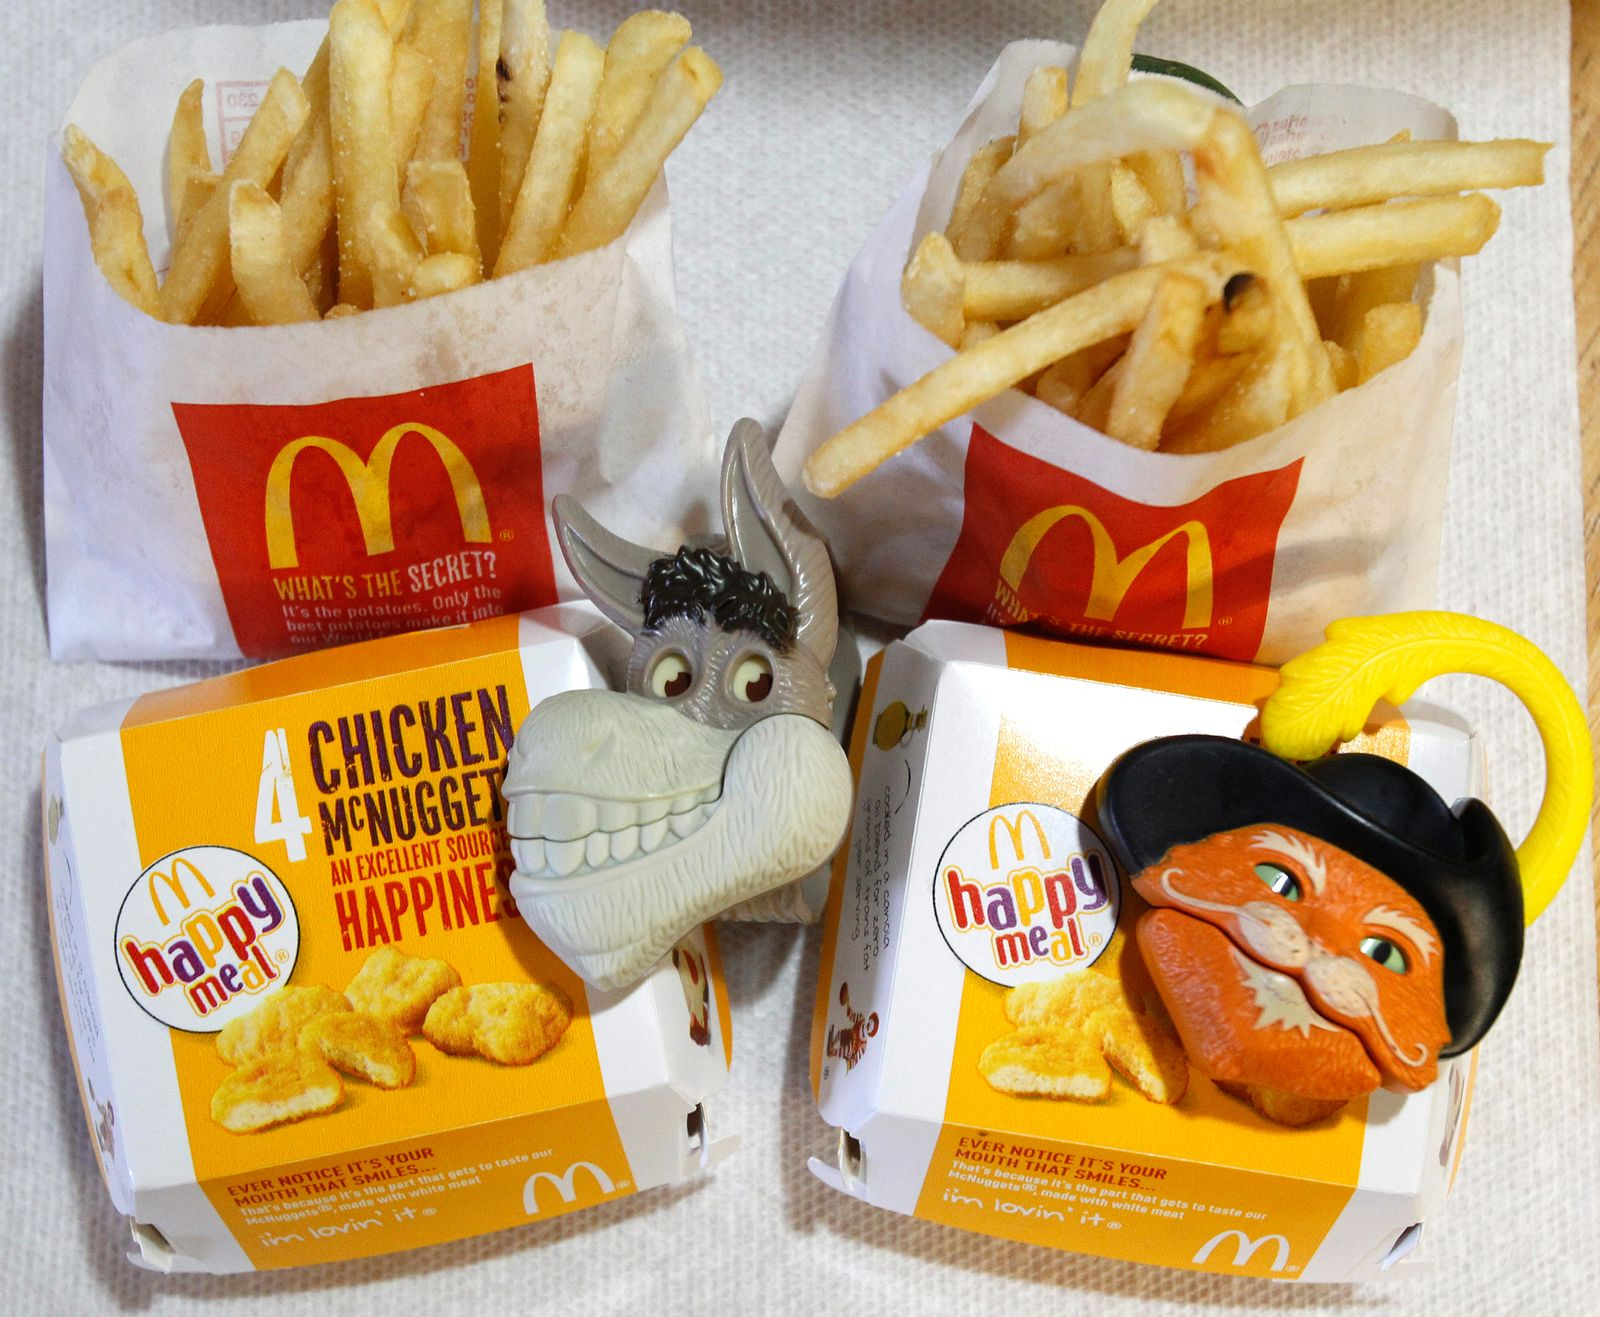 McDonalds / McDonalds / Happy Meal